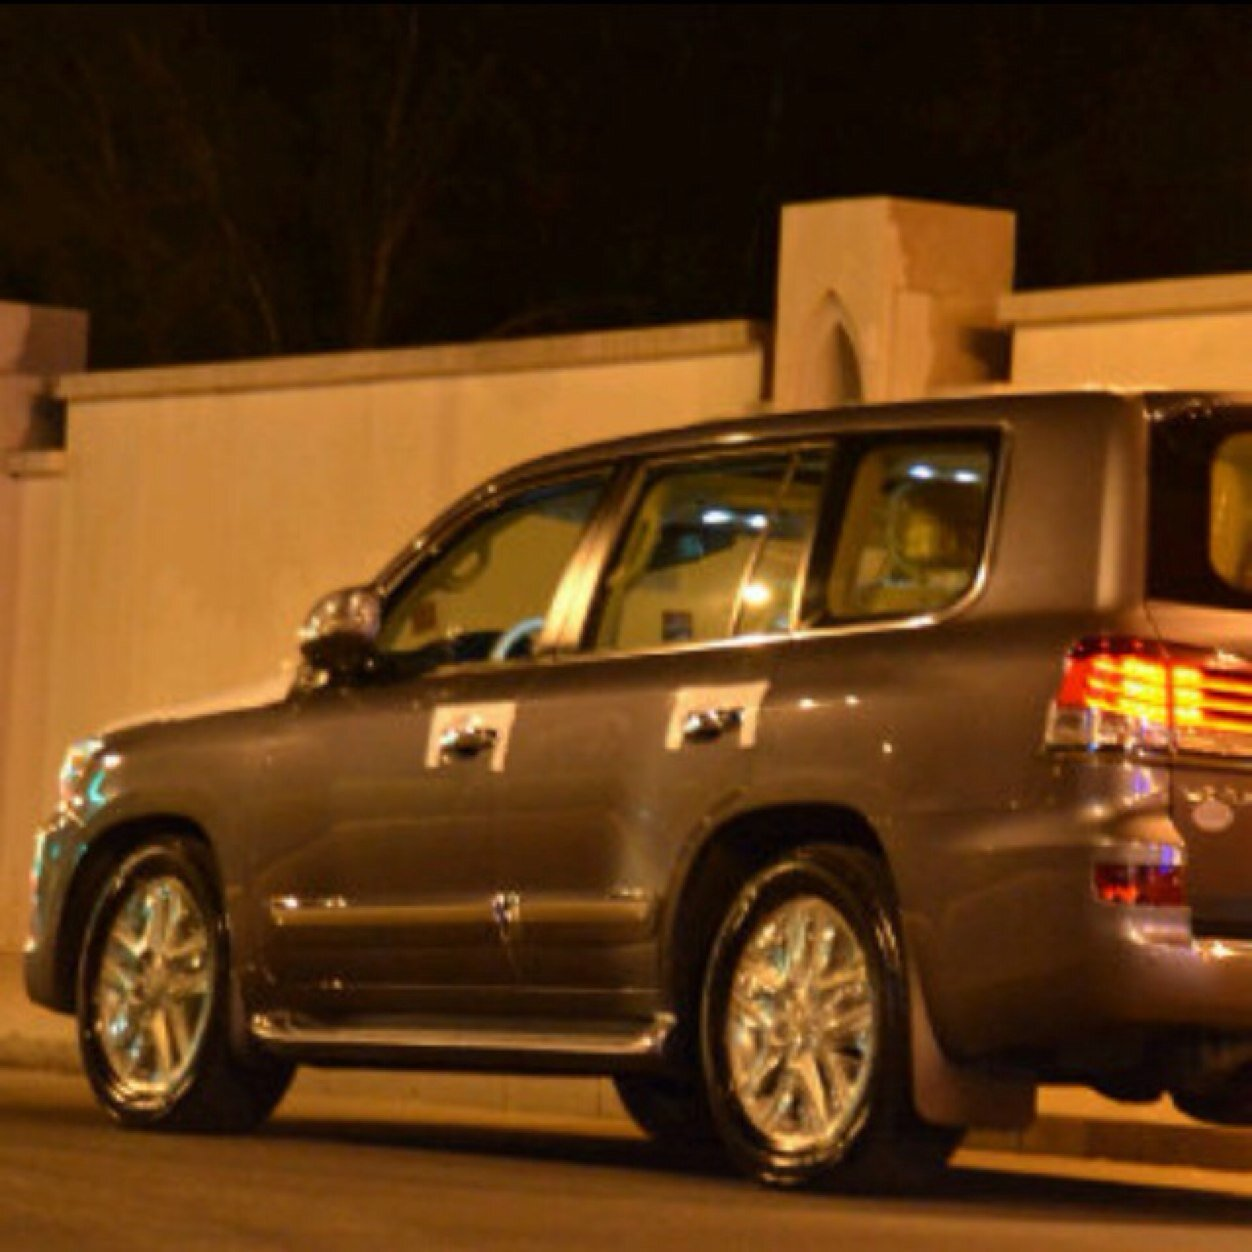 حراج سيارات Mohamad54547 Twitter